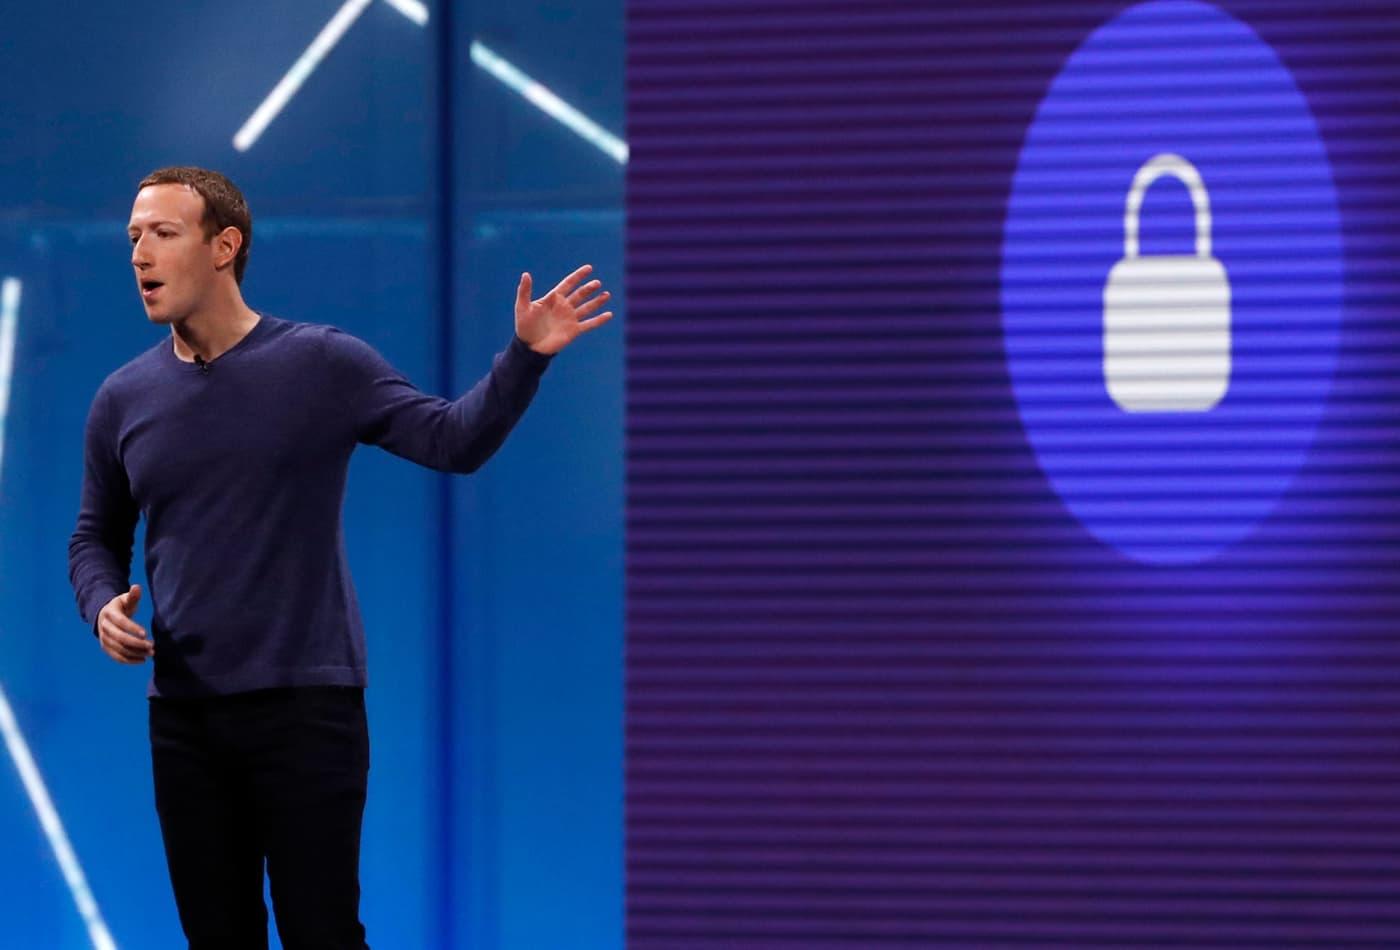 Facebook denies building eye-tracking software